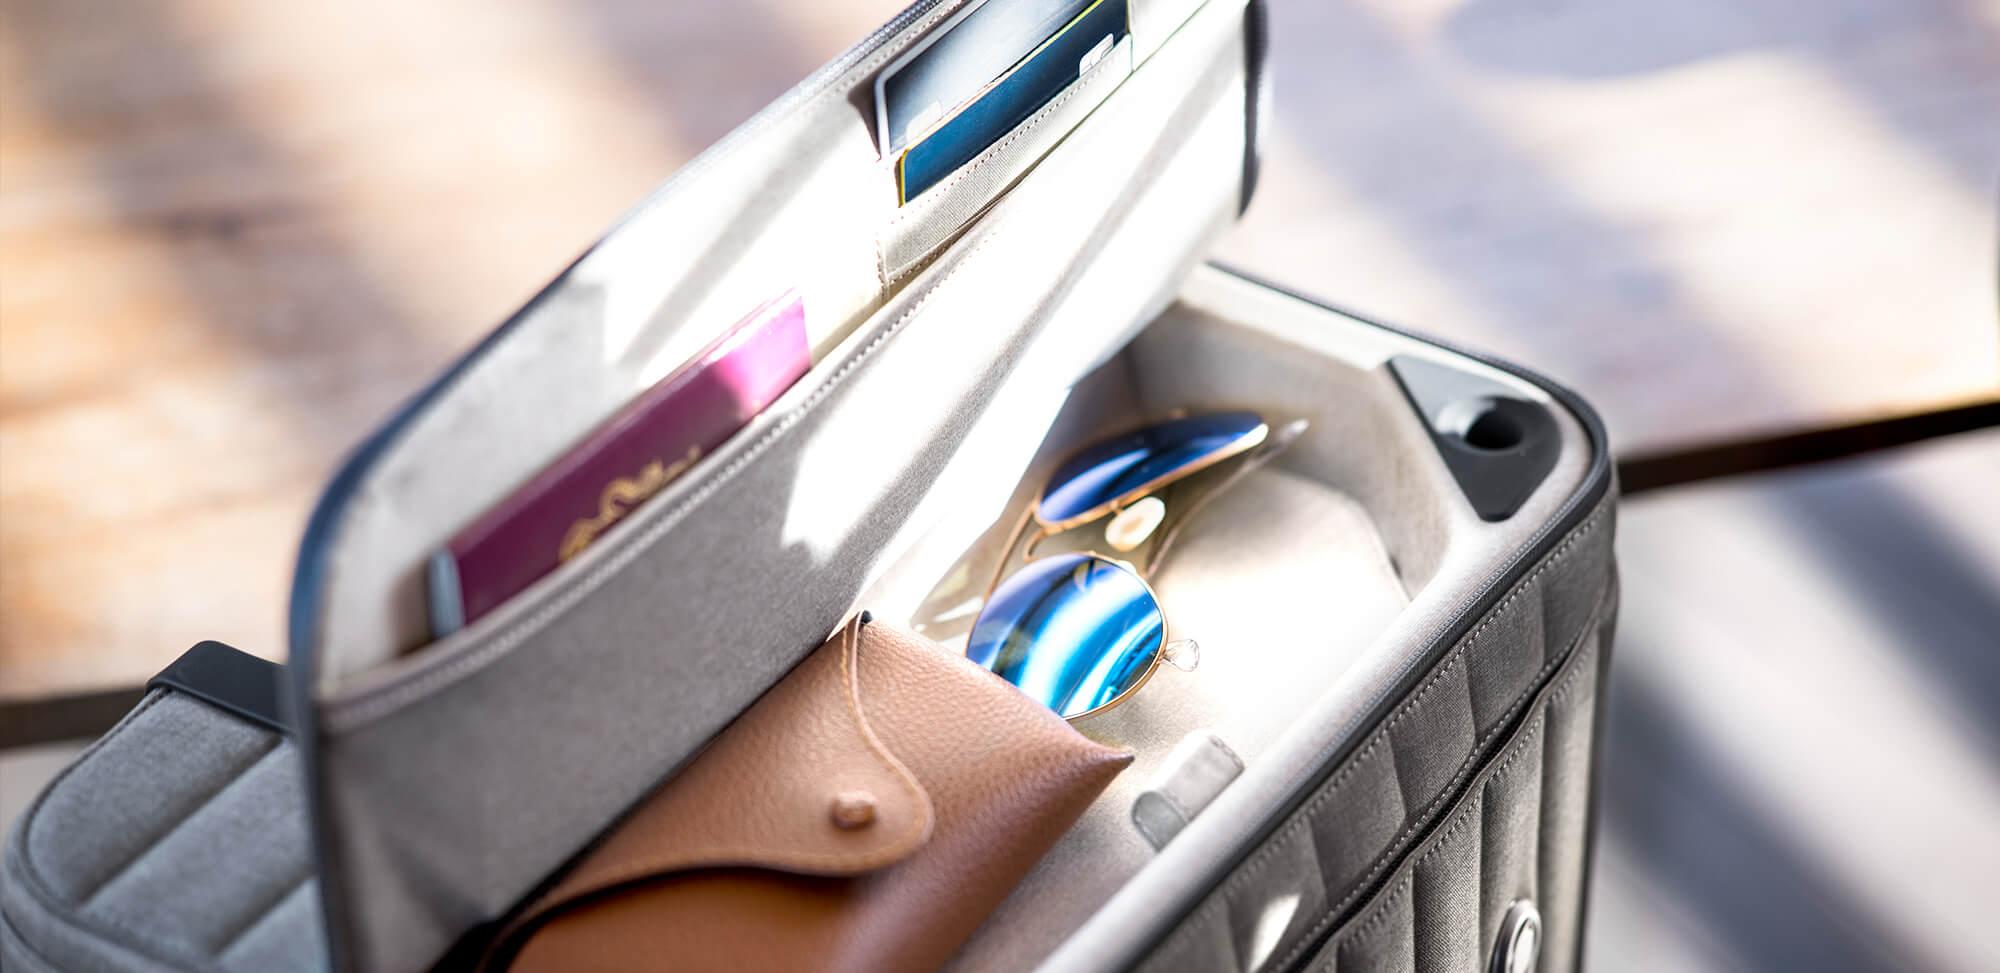 Rollogo-Escape-smart-luggage-mobile-office-Top-compartment.jpg